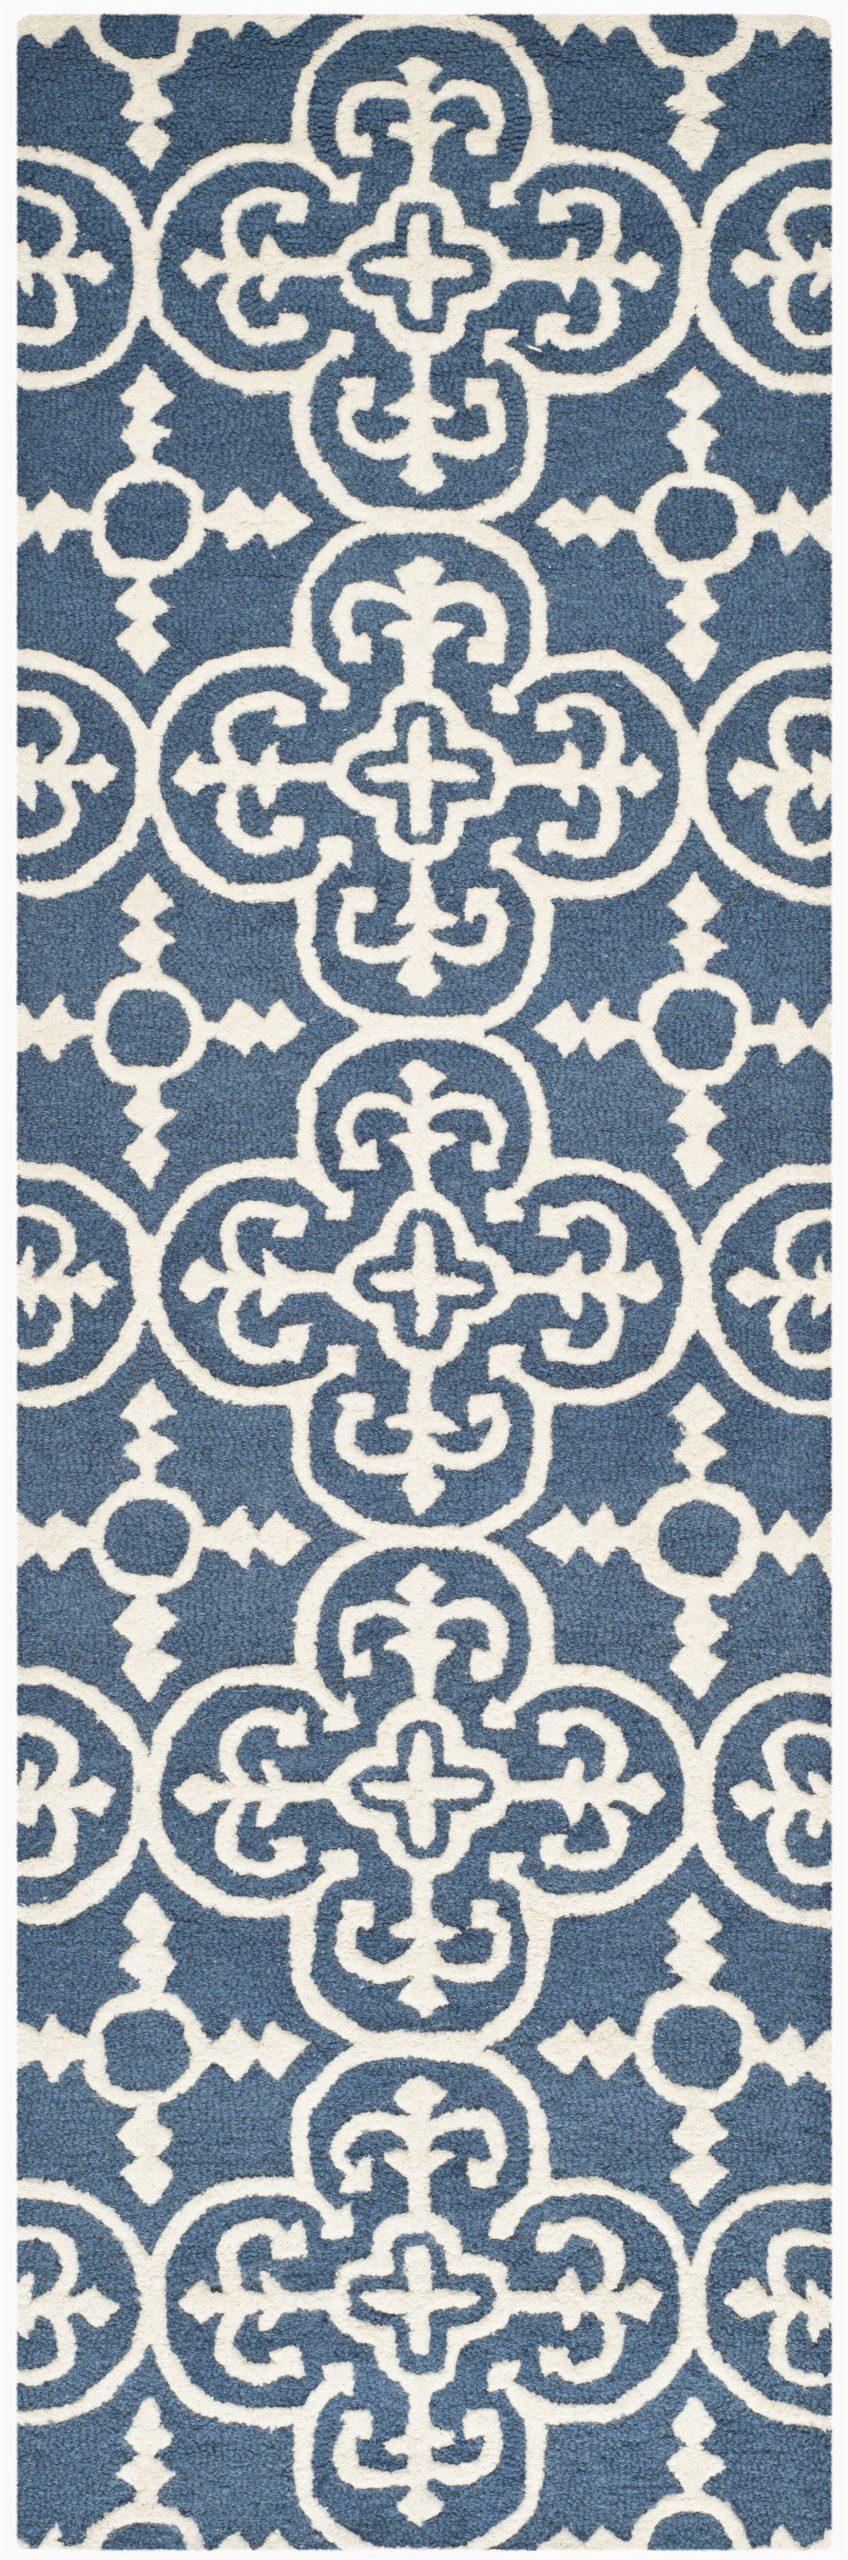 three posts byron geometric hand tufted wool navy blueivory wool area rug thps3682 piid=